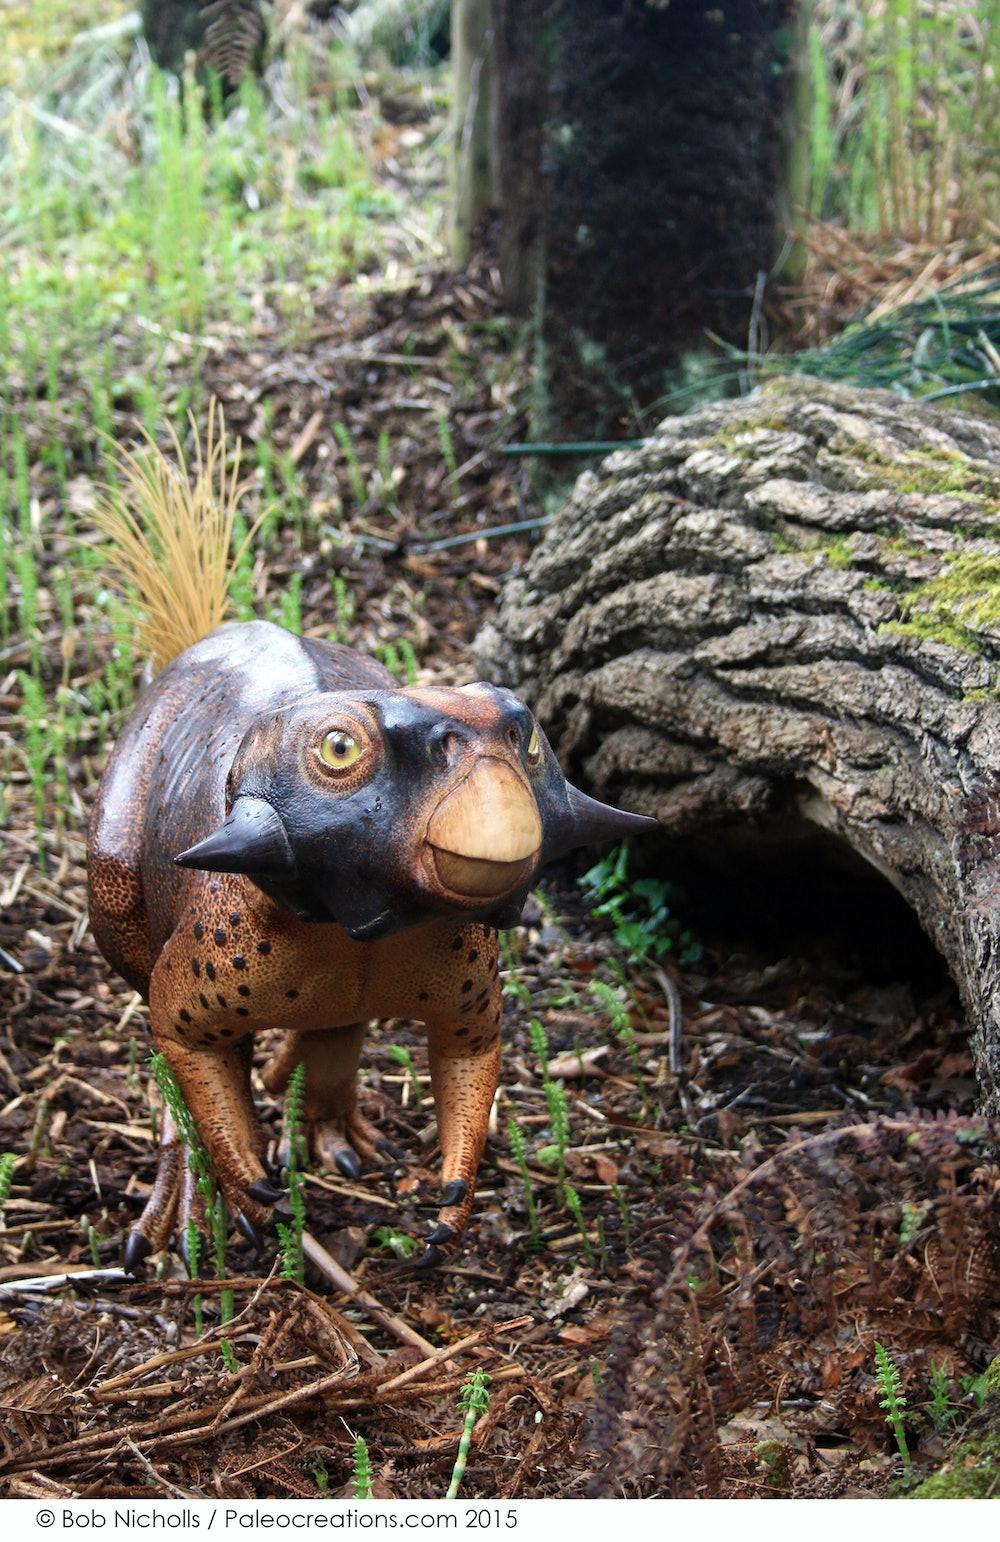 Pudgy Psittacosaurus display